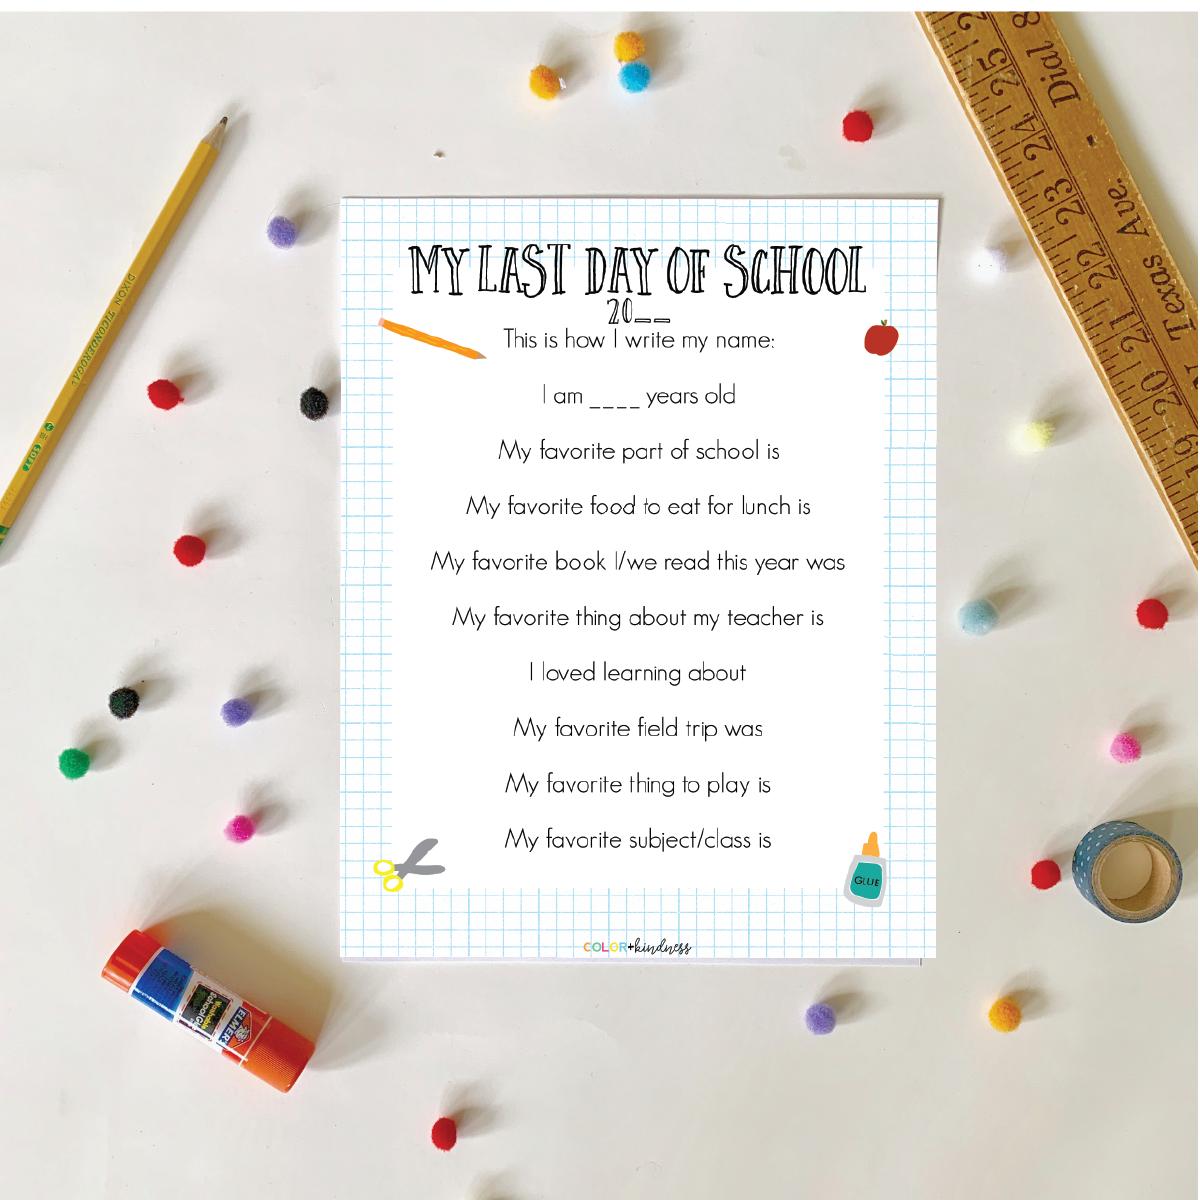 mylastdayofschool-01.png